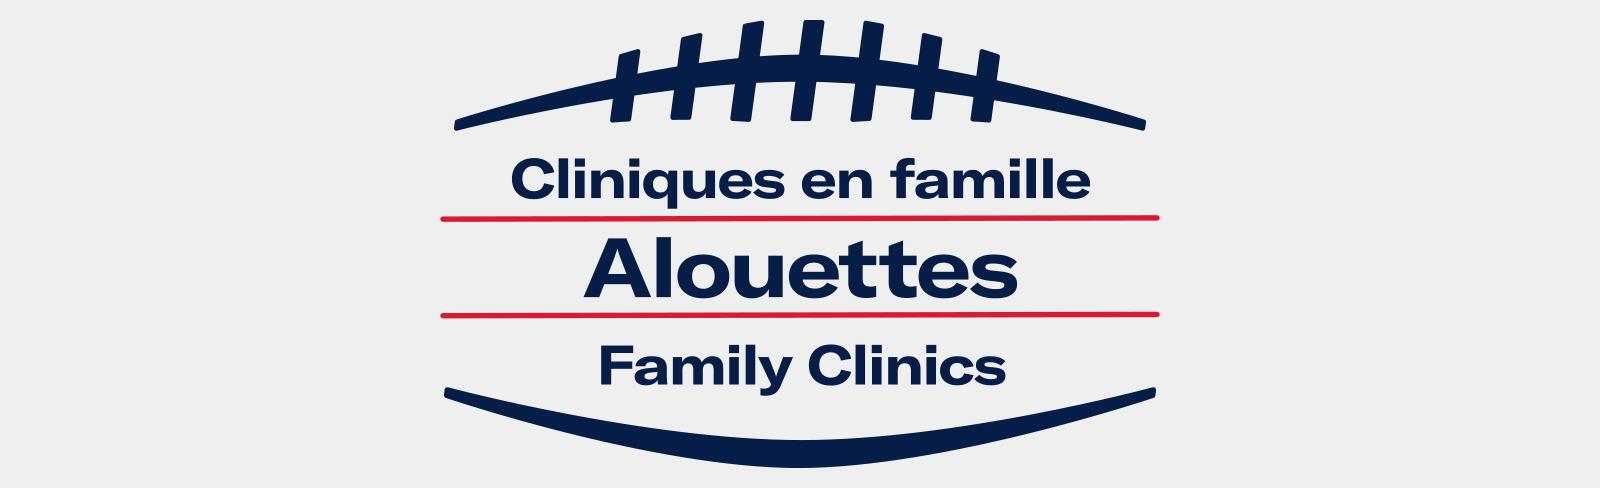 Family Clinics - Montreal Alouettes